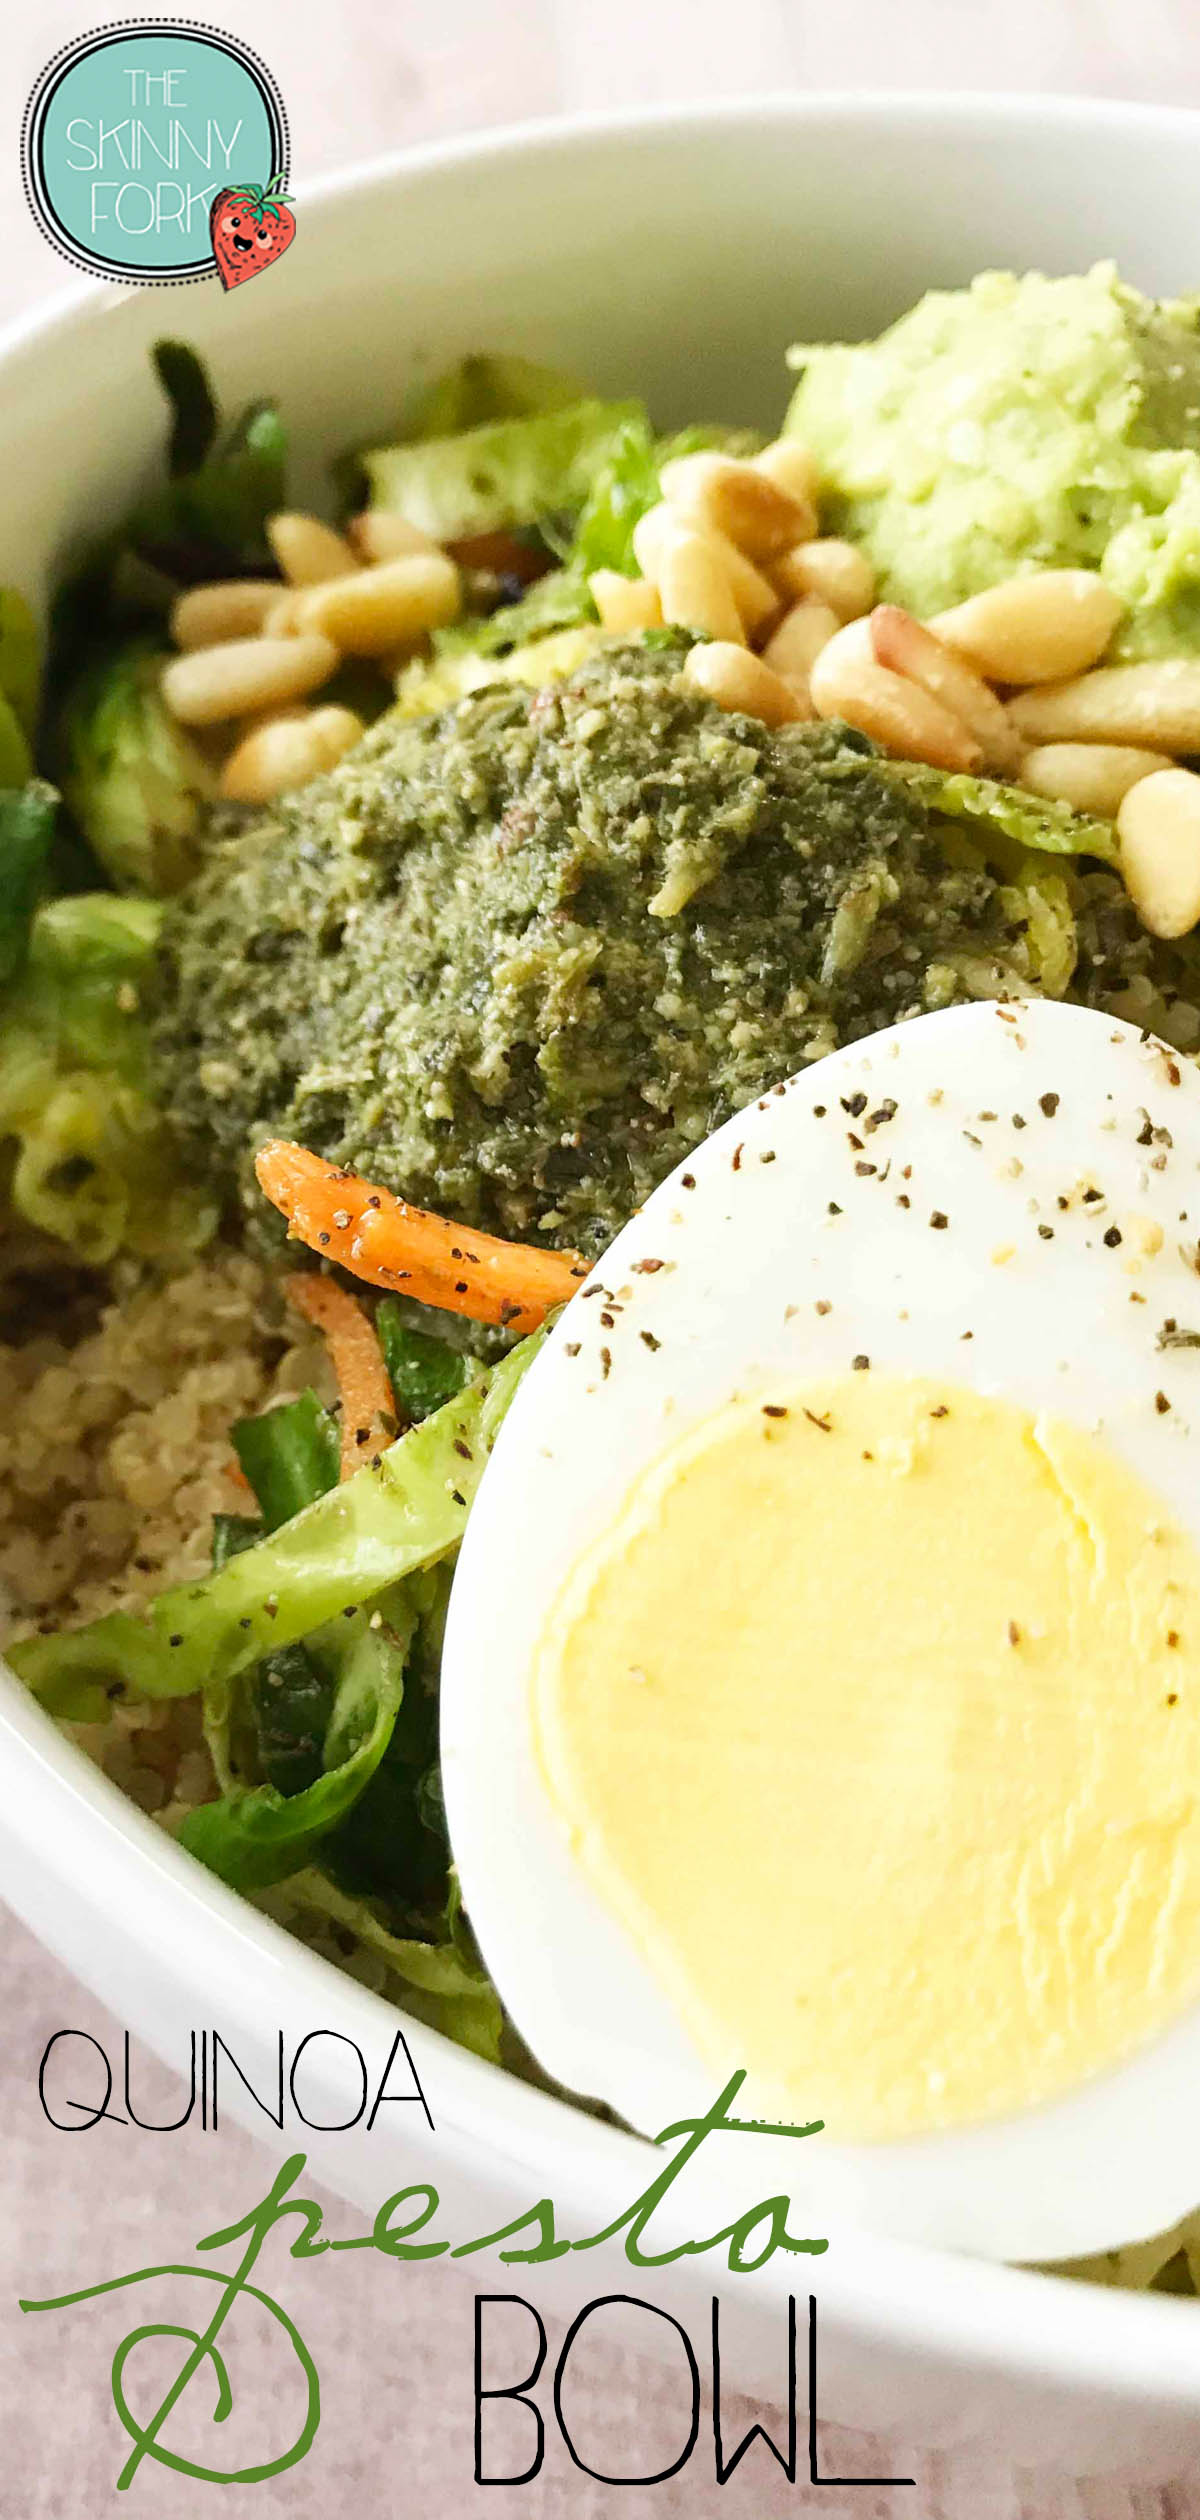 Quinoa Pesto Bowl